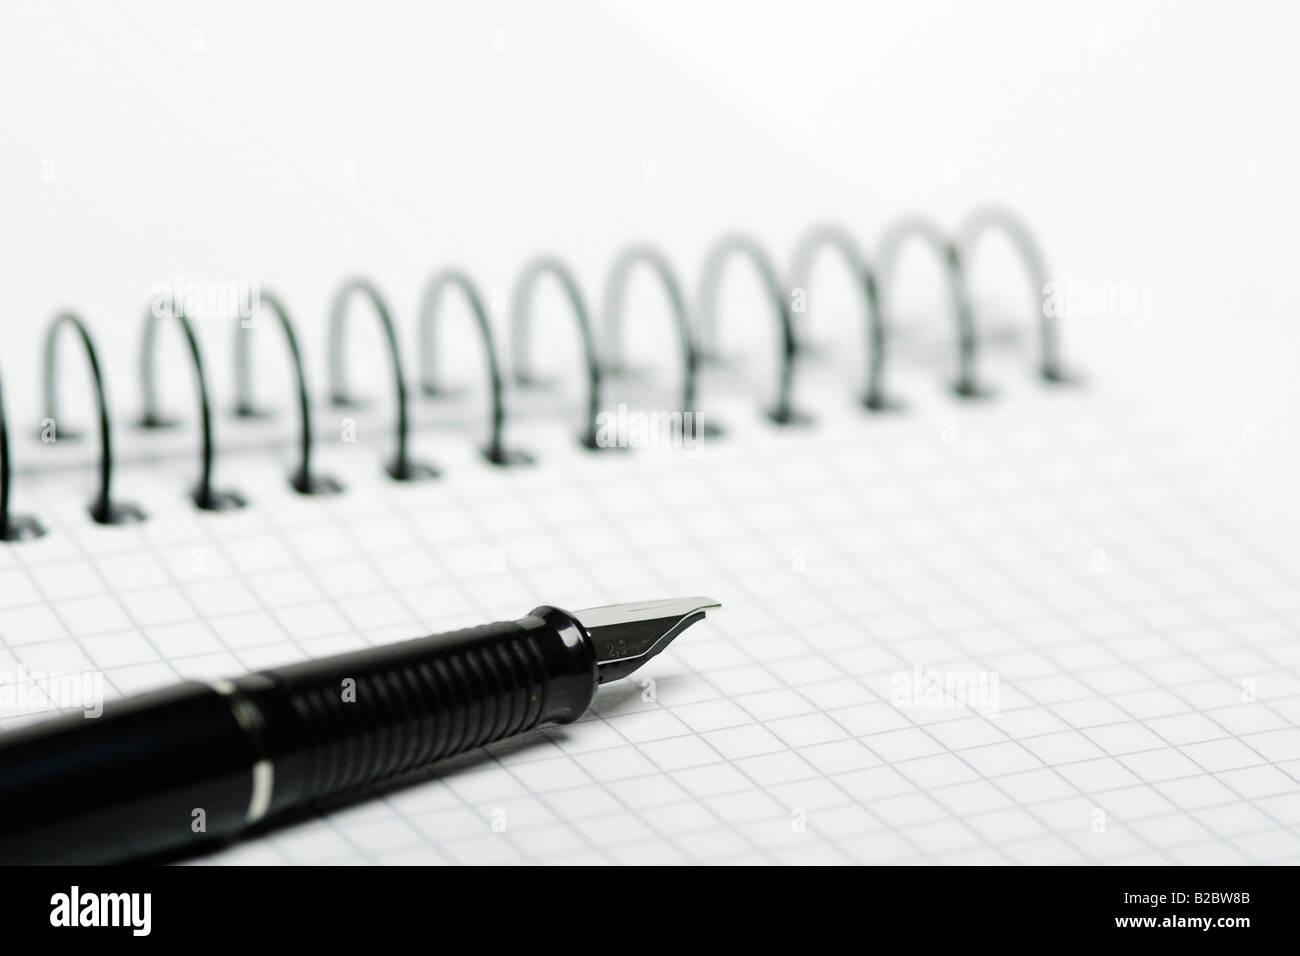 Fountain pen on a notebook Stock Photo